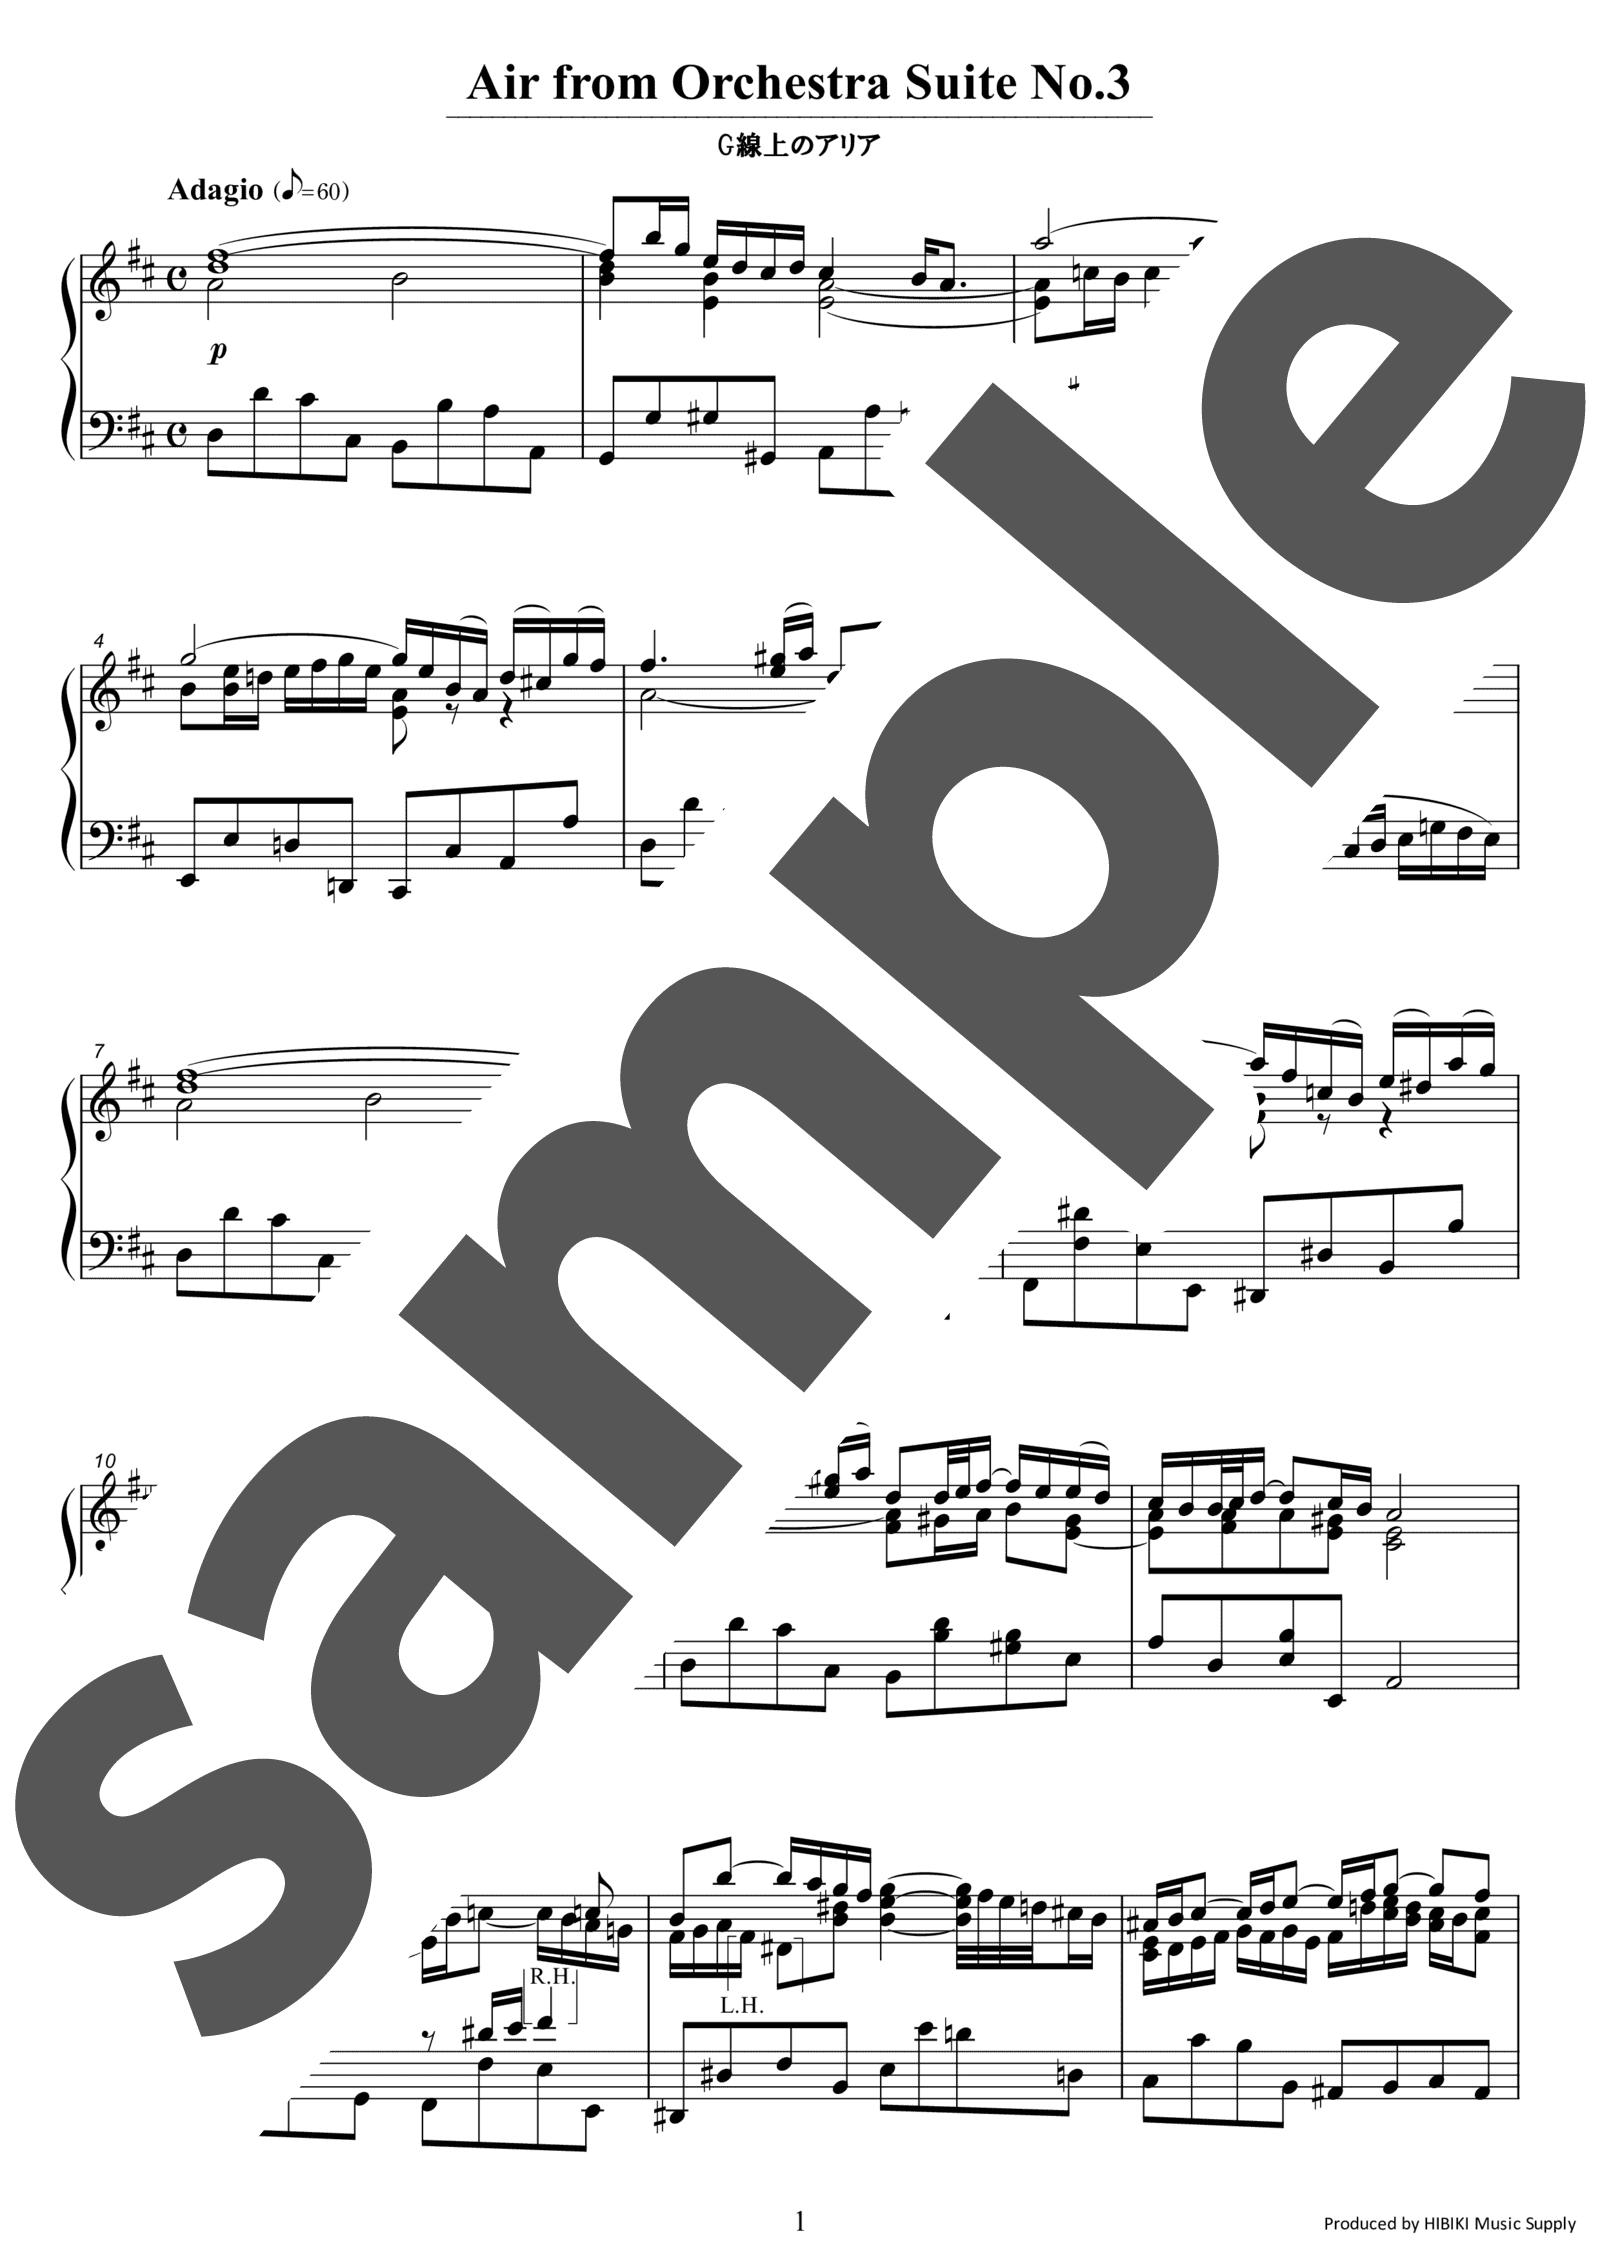 「G線上のアリア」のサンプル楽譜